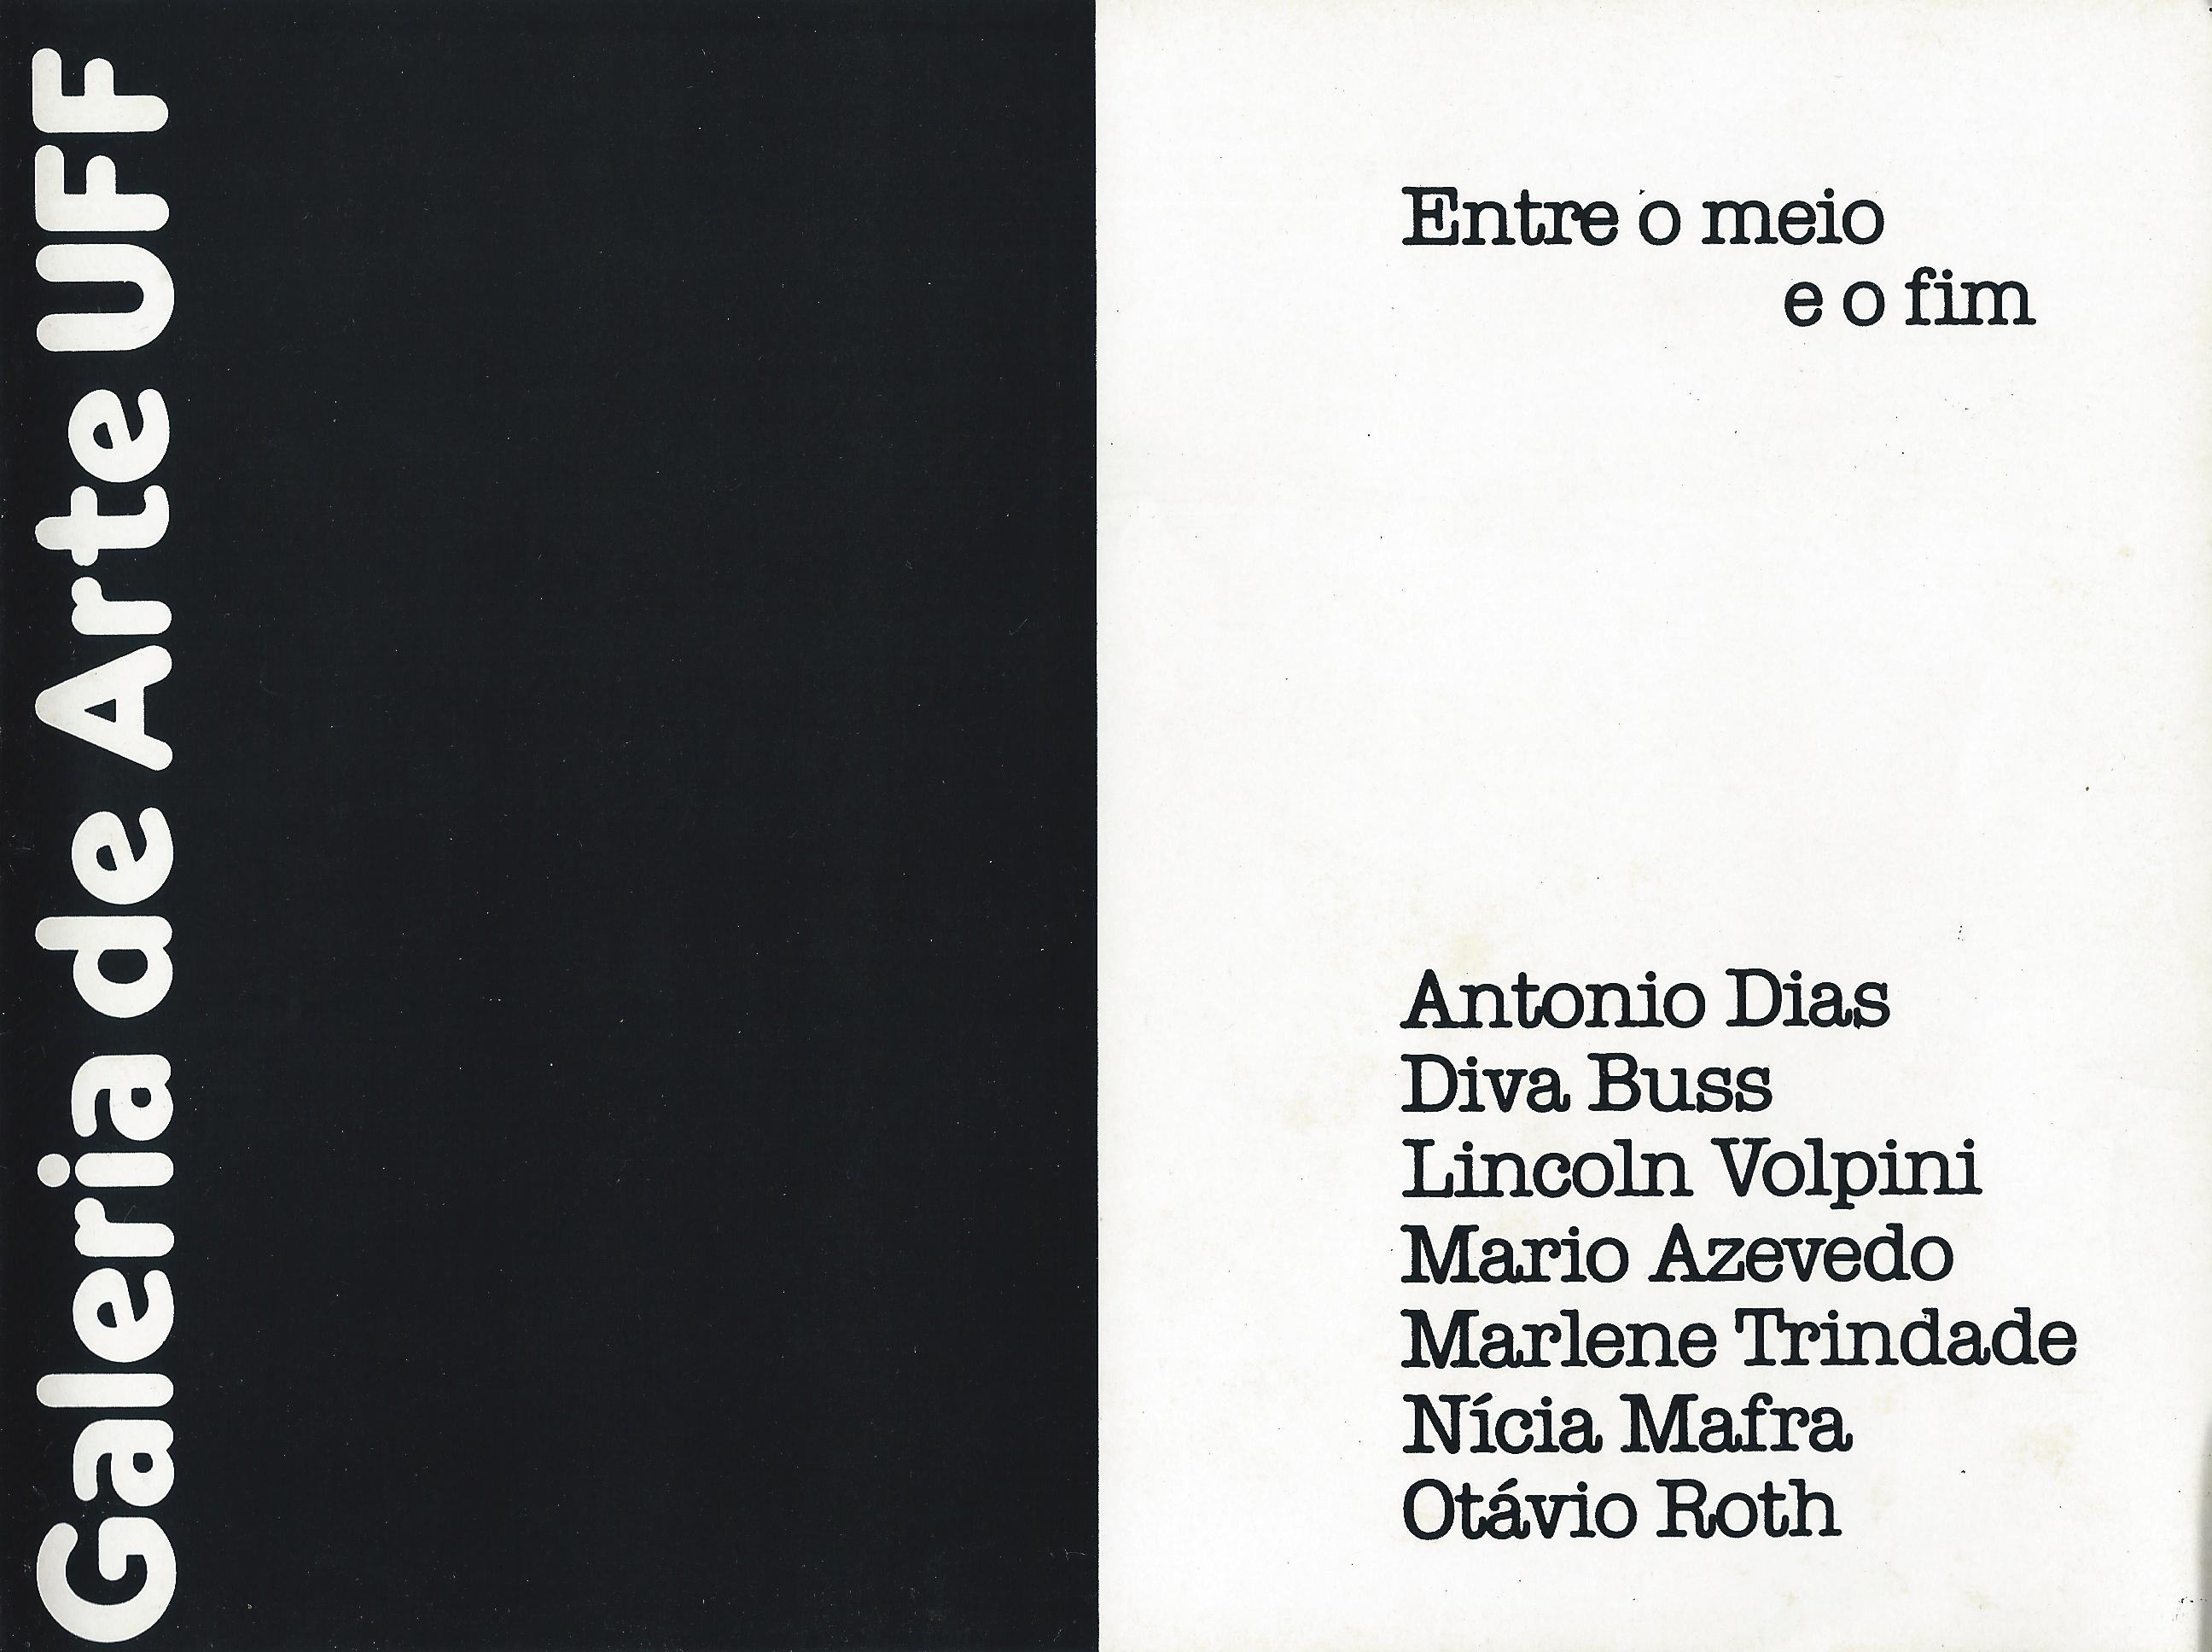 Coletiva Entre o meio e o fim - UFF 1984 1